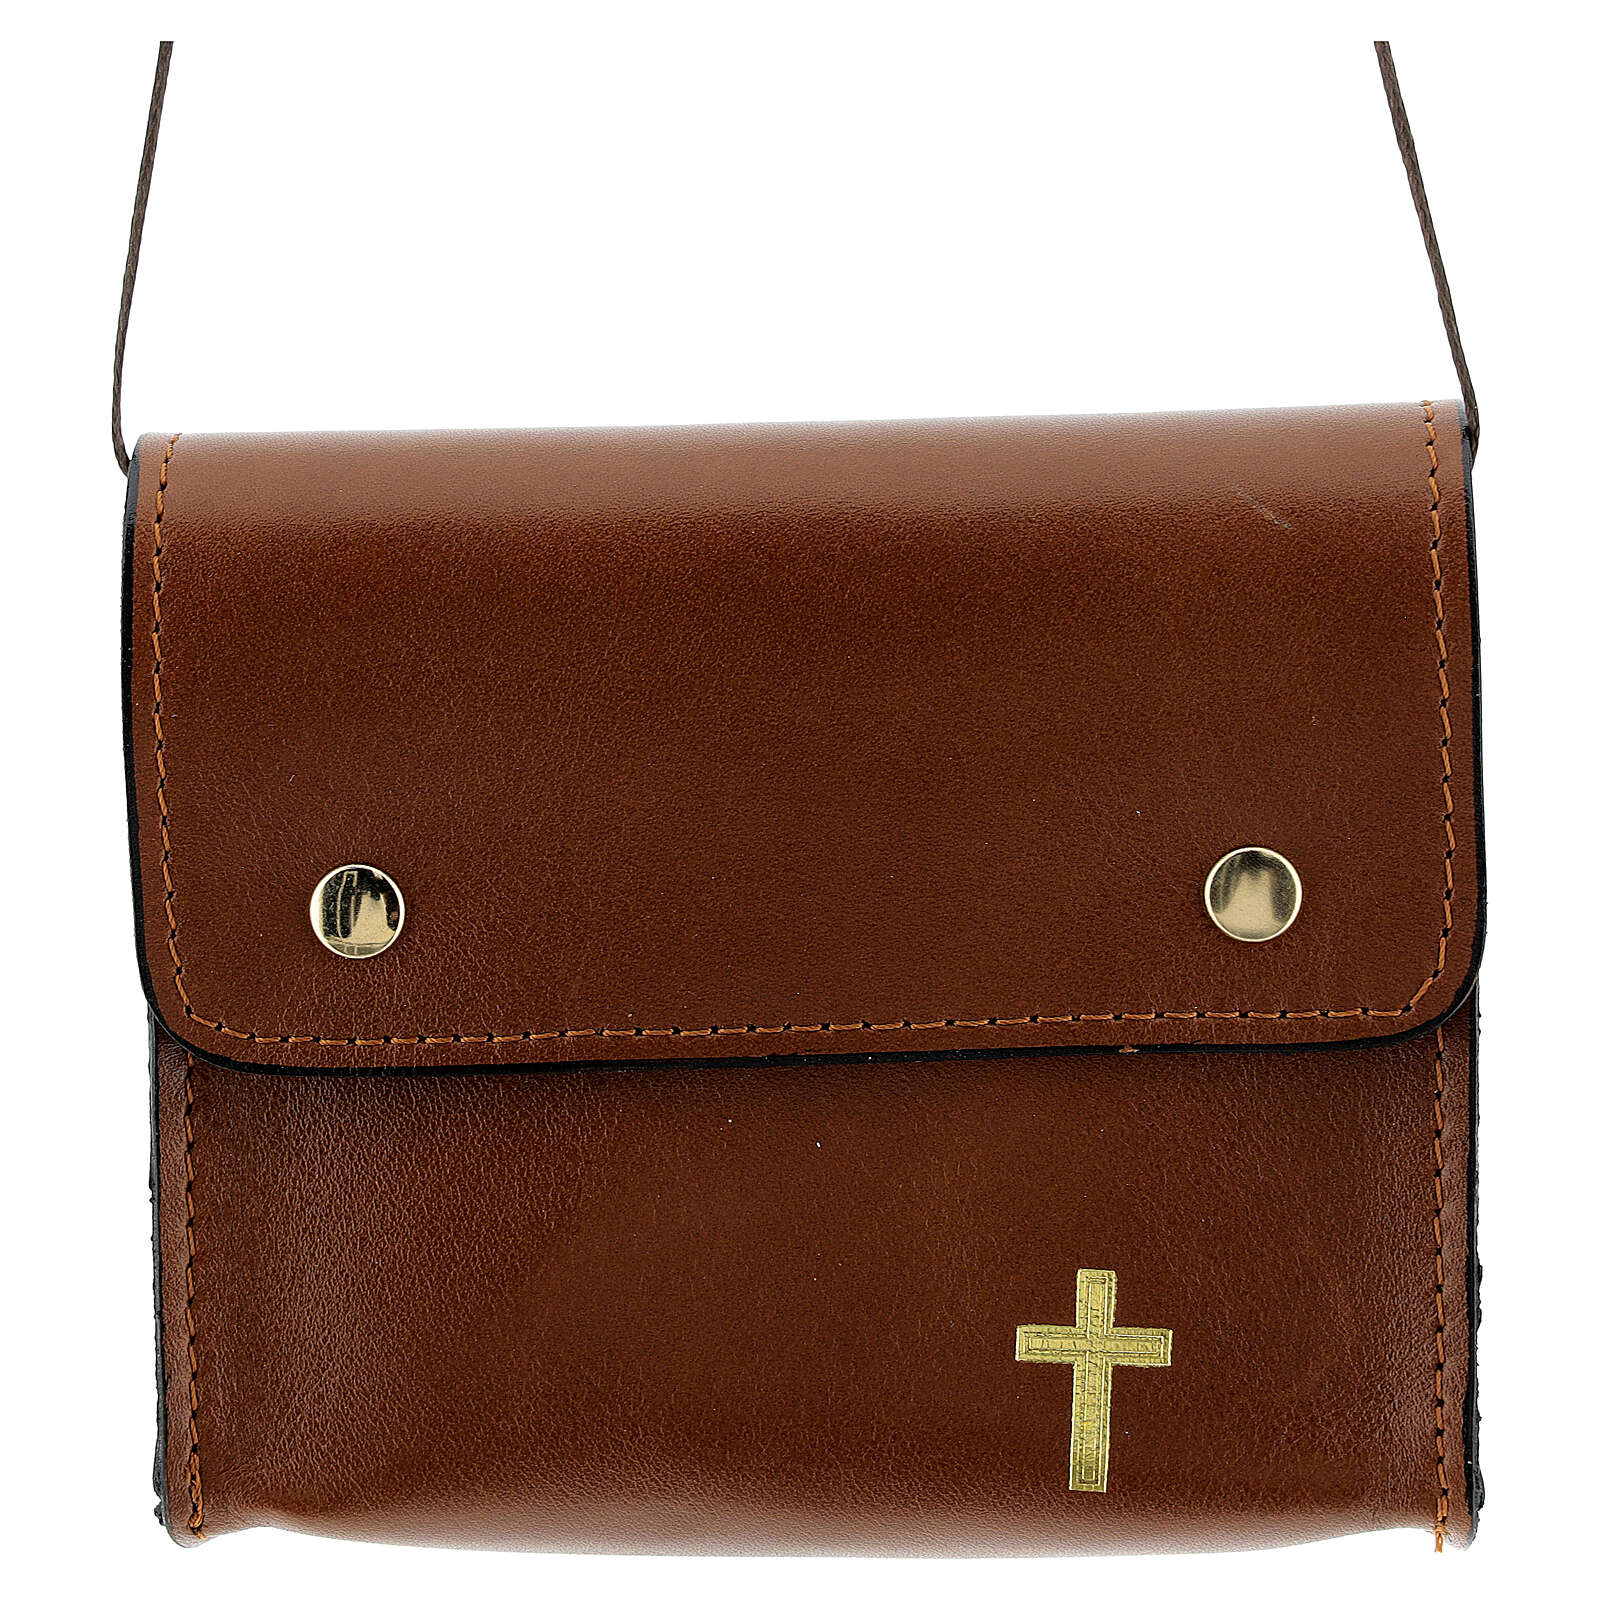 Paten burse 4x5 in real brown leather 4